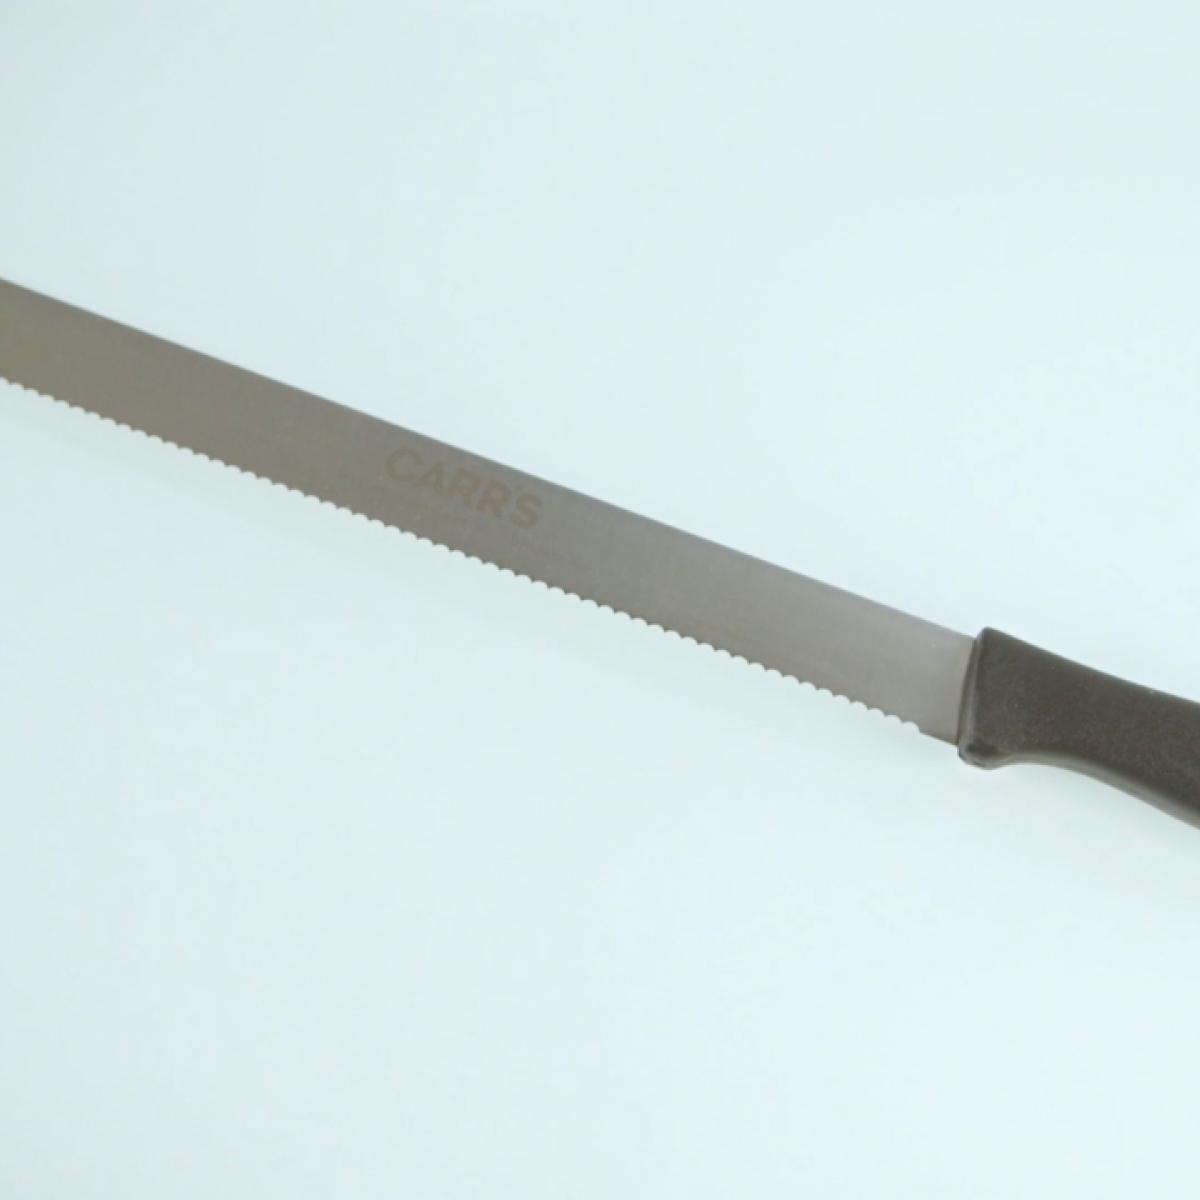 Equipment bread knife